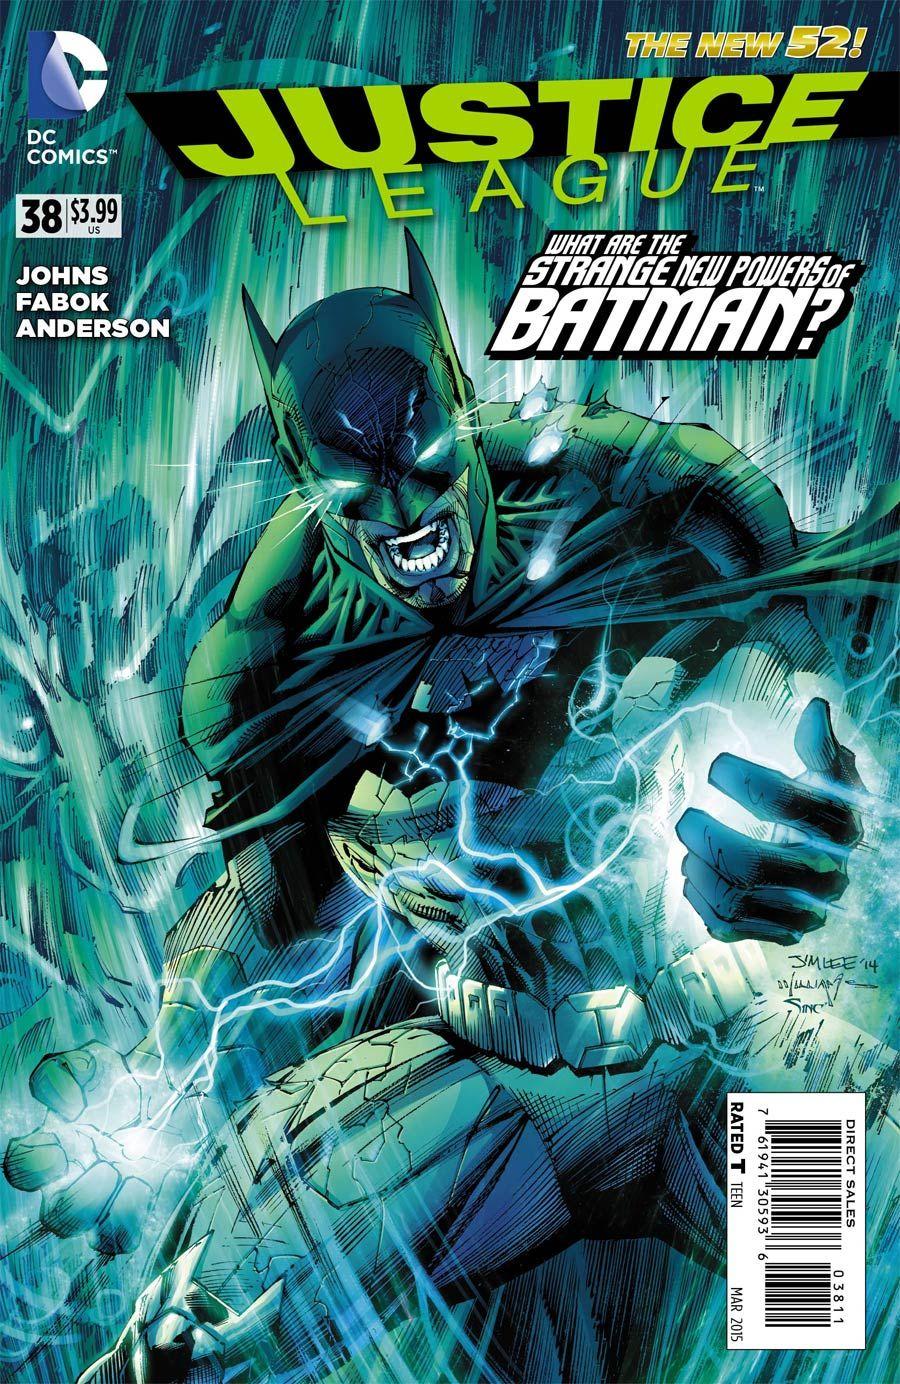 Justice League Vol 2 #38 Cover A Regular Jim Lee Cover